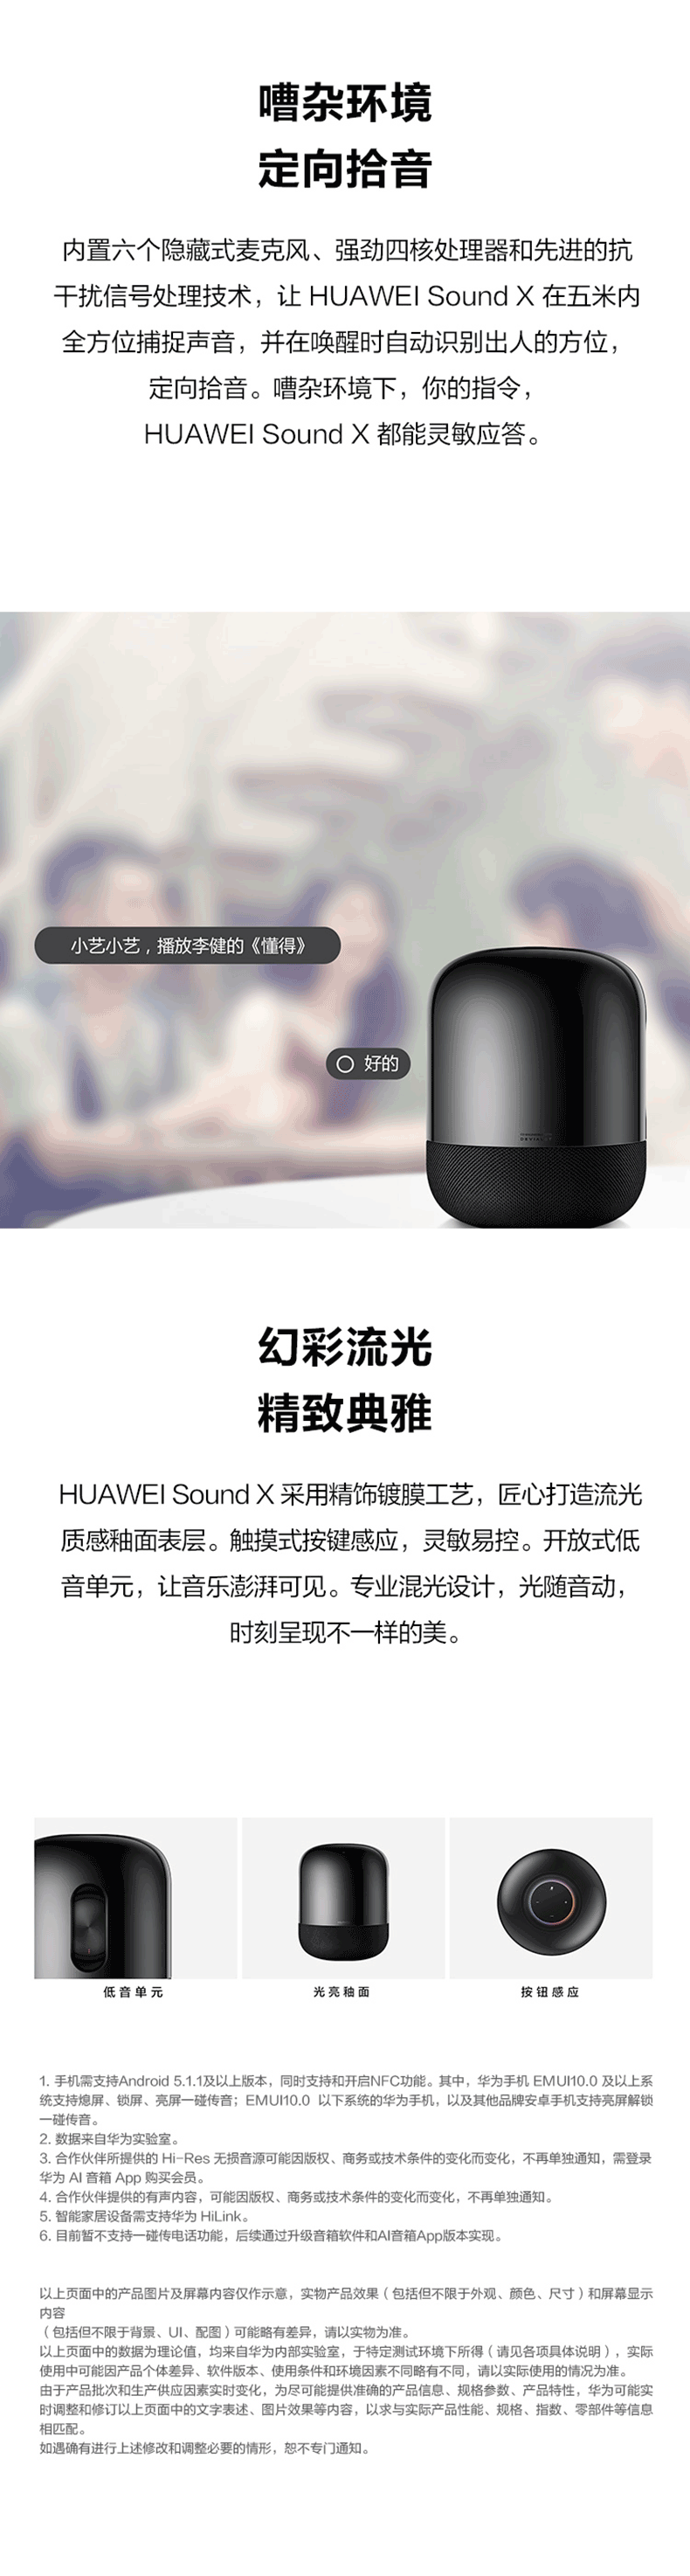 Loa Bluetooth Huawei sound x Bluetooth speaker